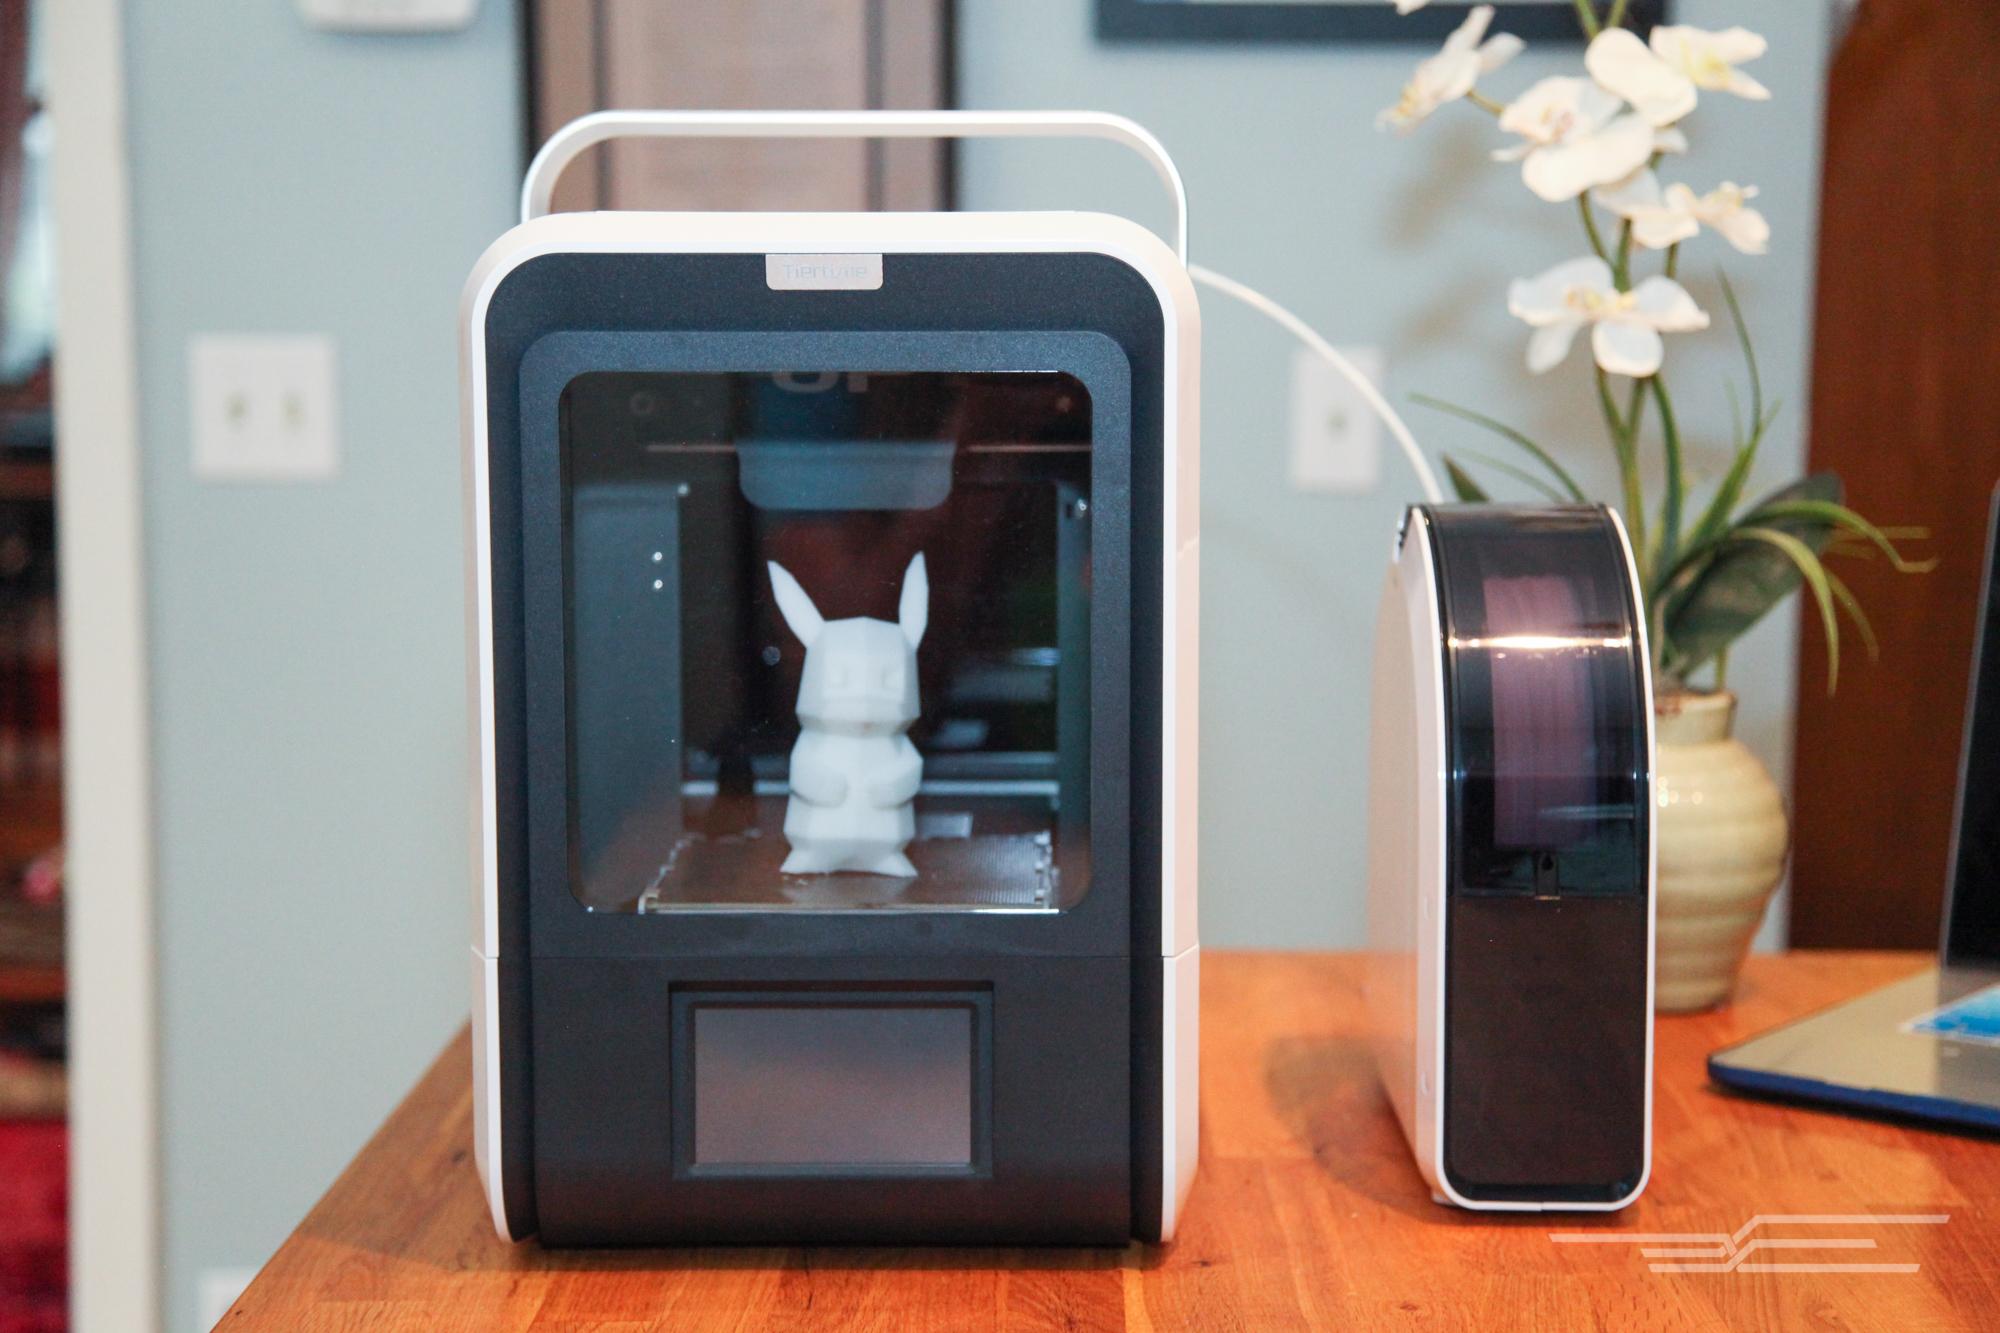 The best home 3D printer for beginners so far